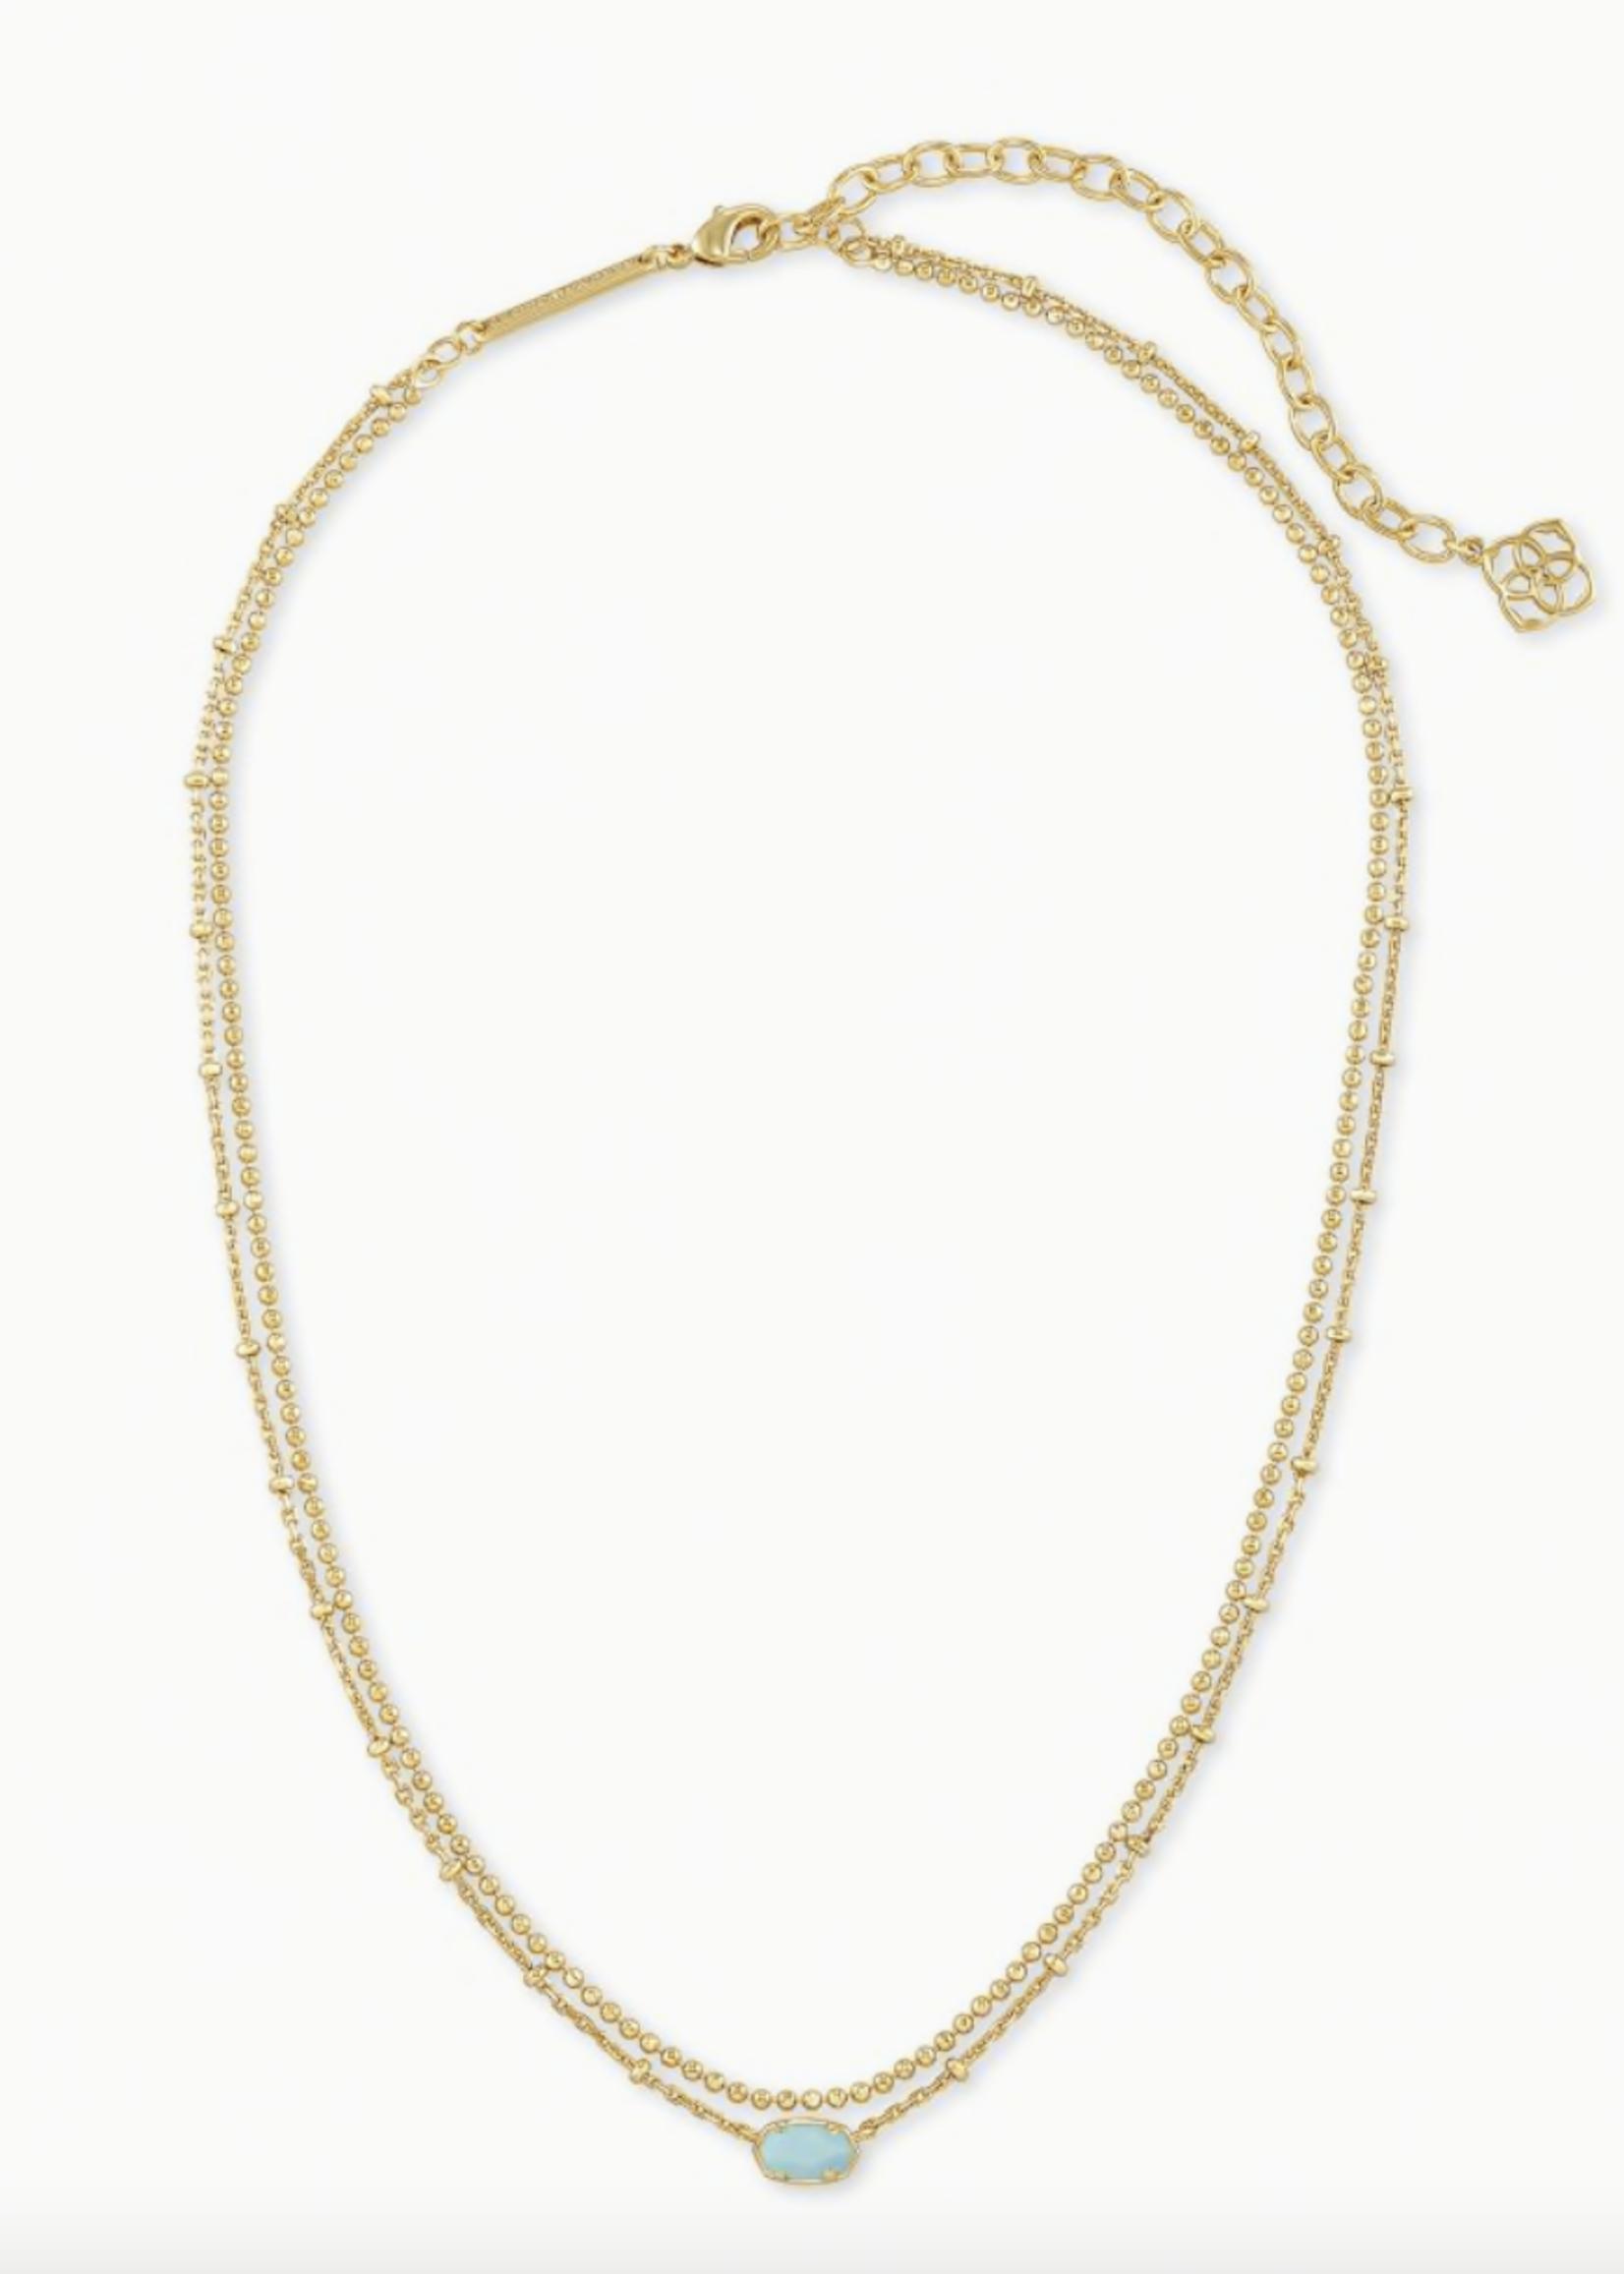 Kendra Scott Kendra Scott Emile Multi Strand Necklace Turquoise